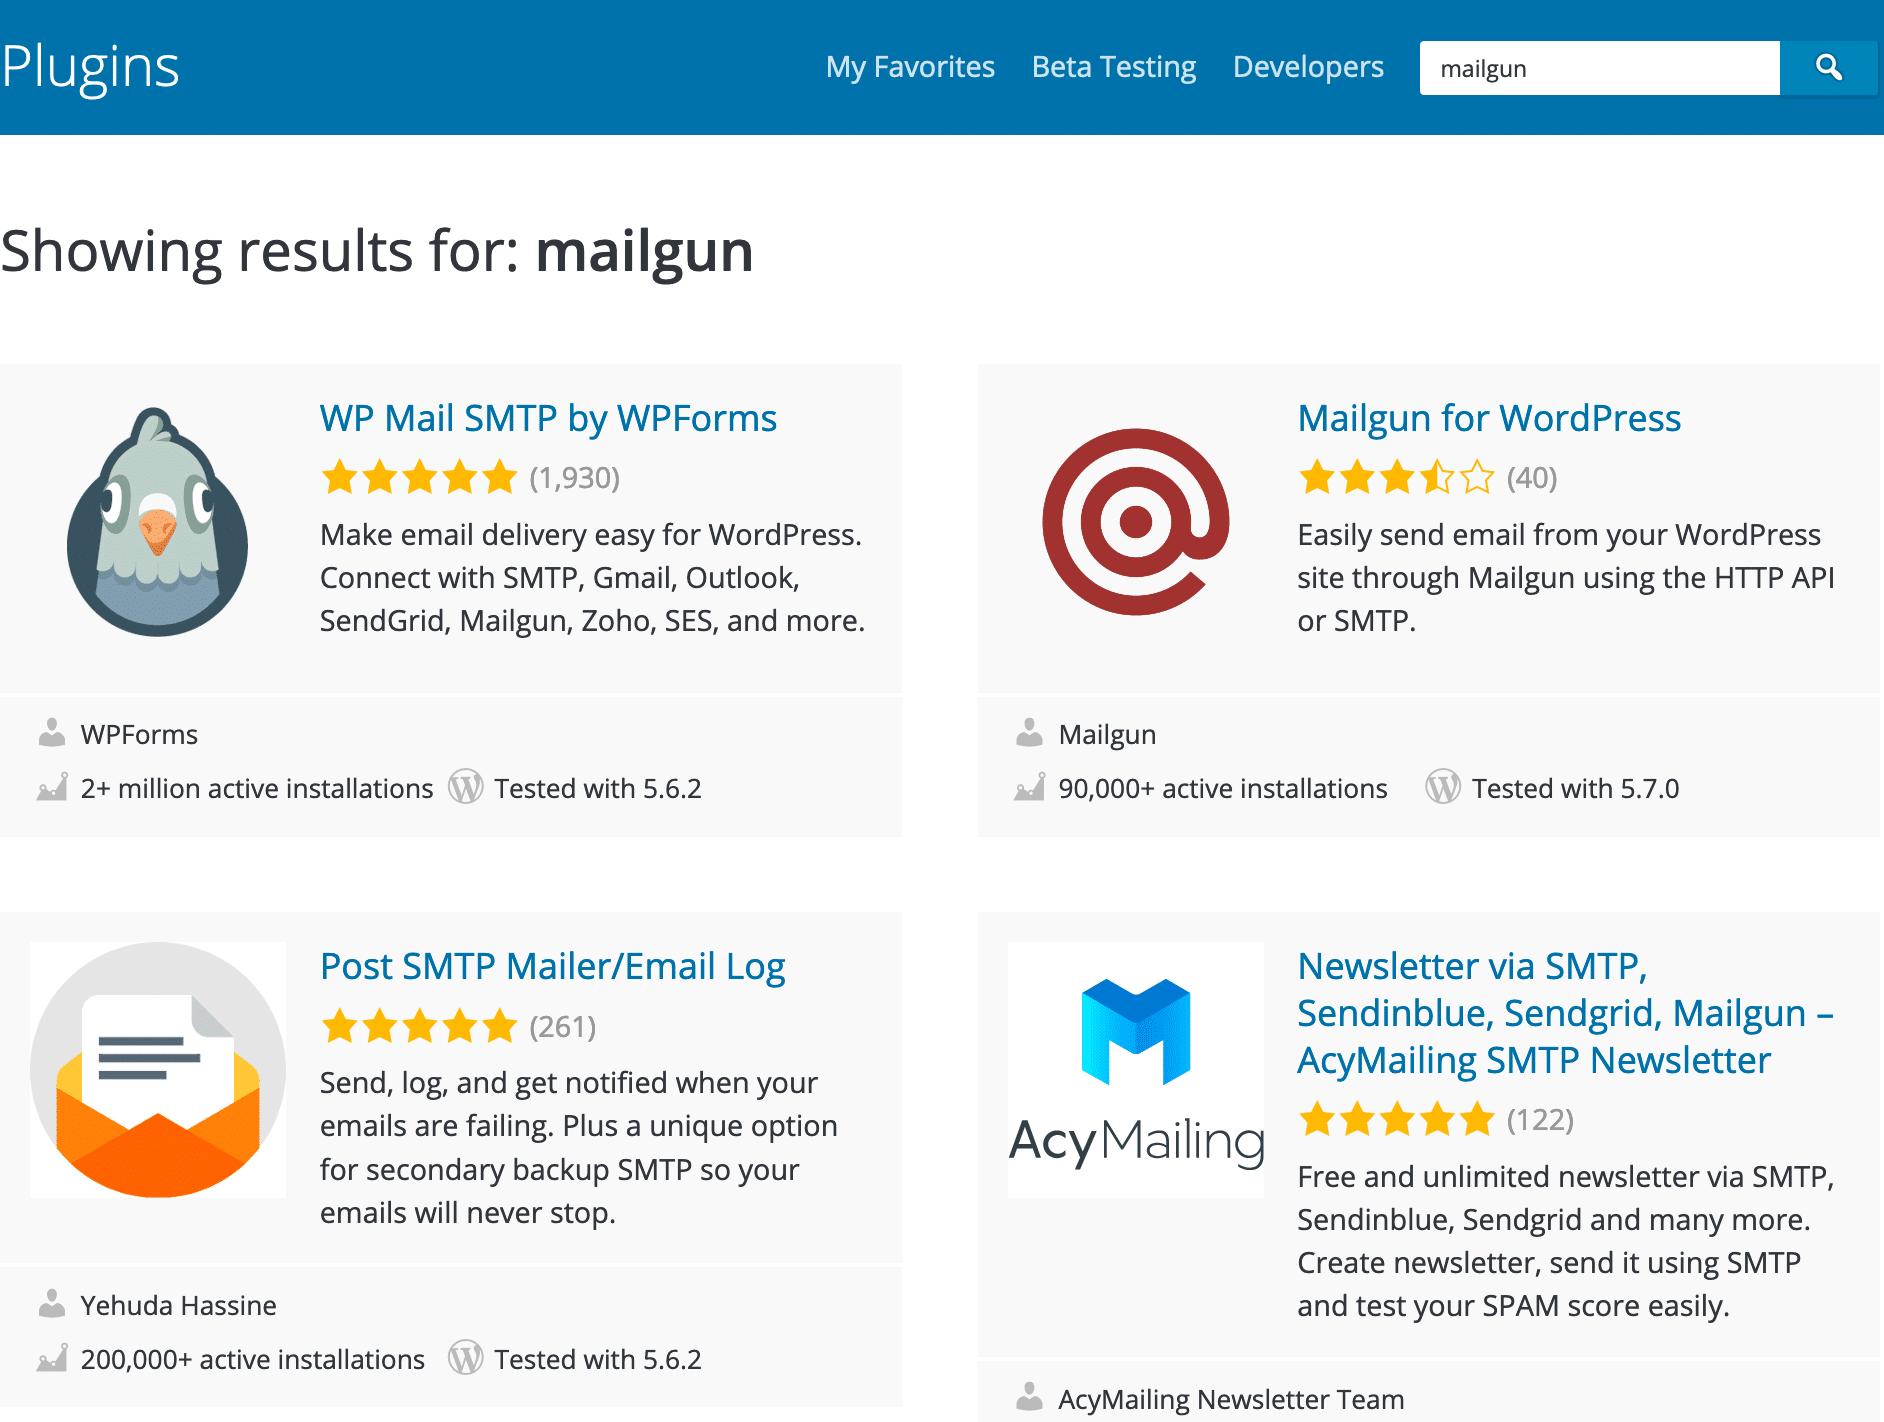 How to setup Mailgun WordPress - Mailgun plugin